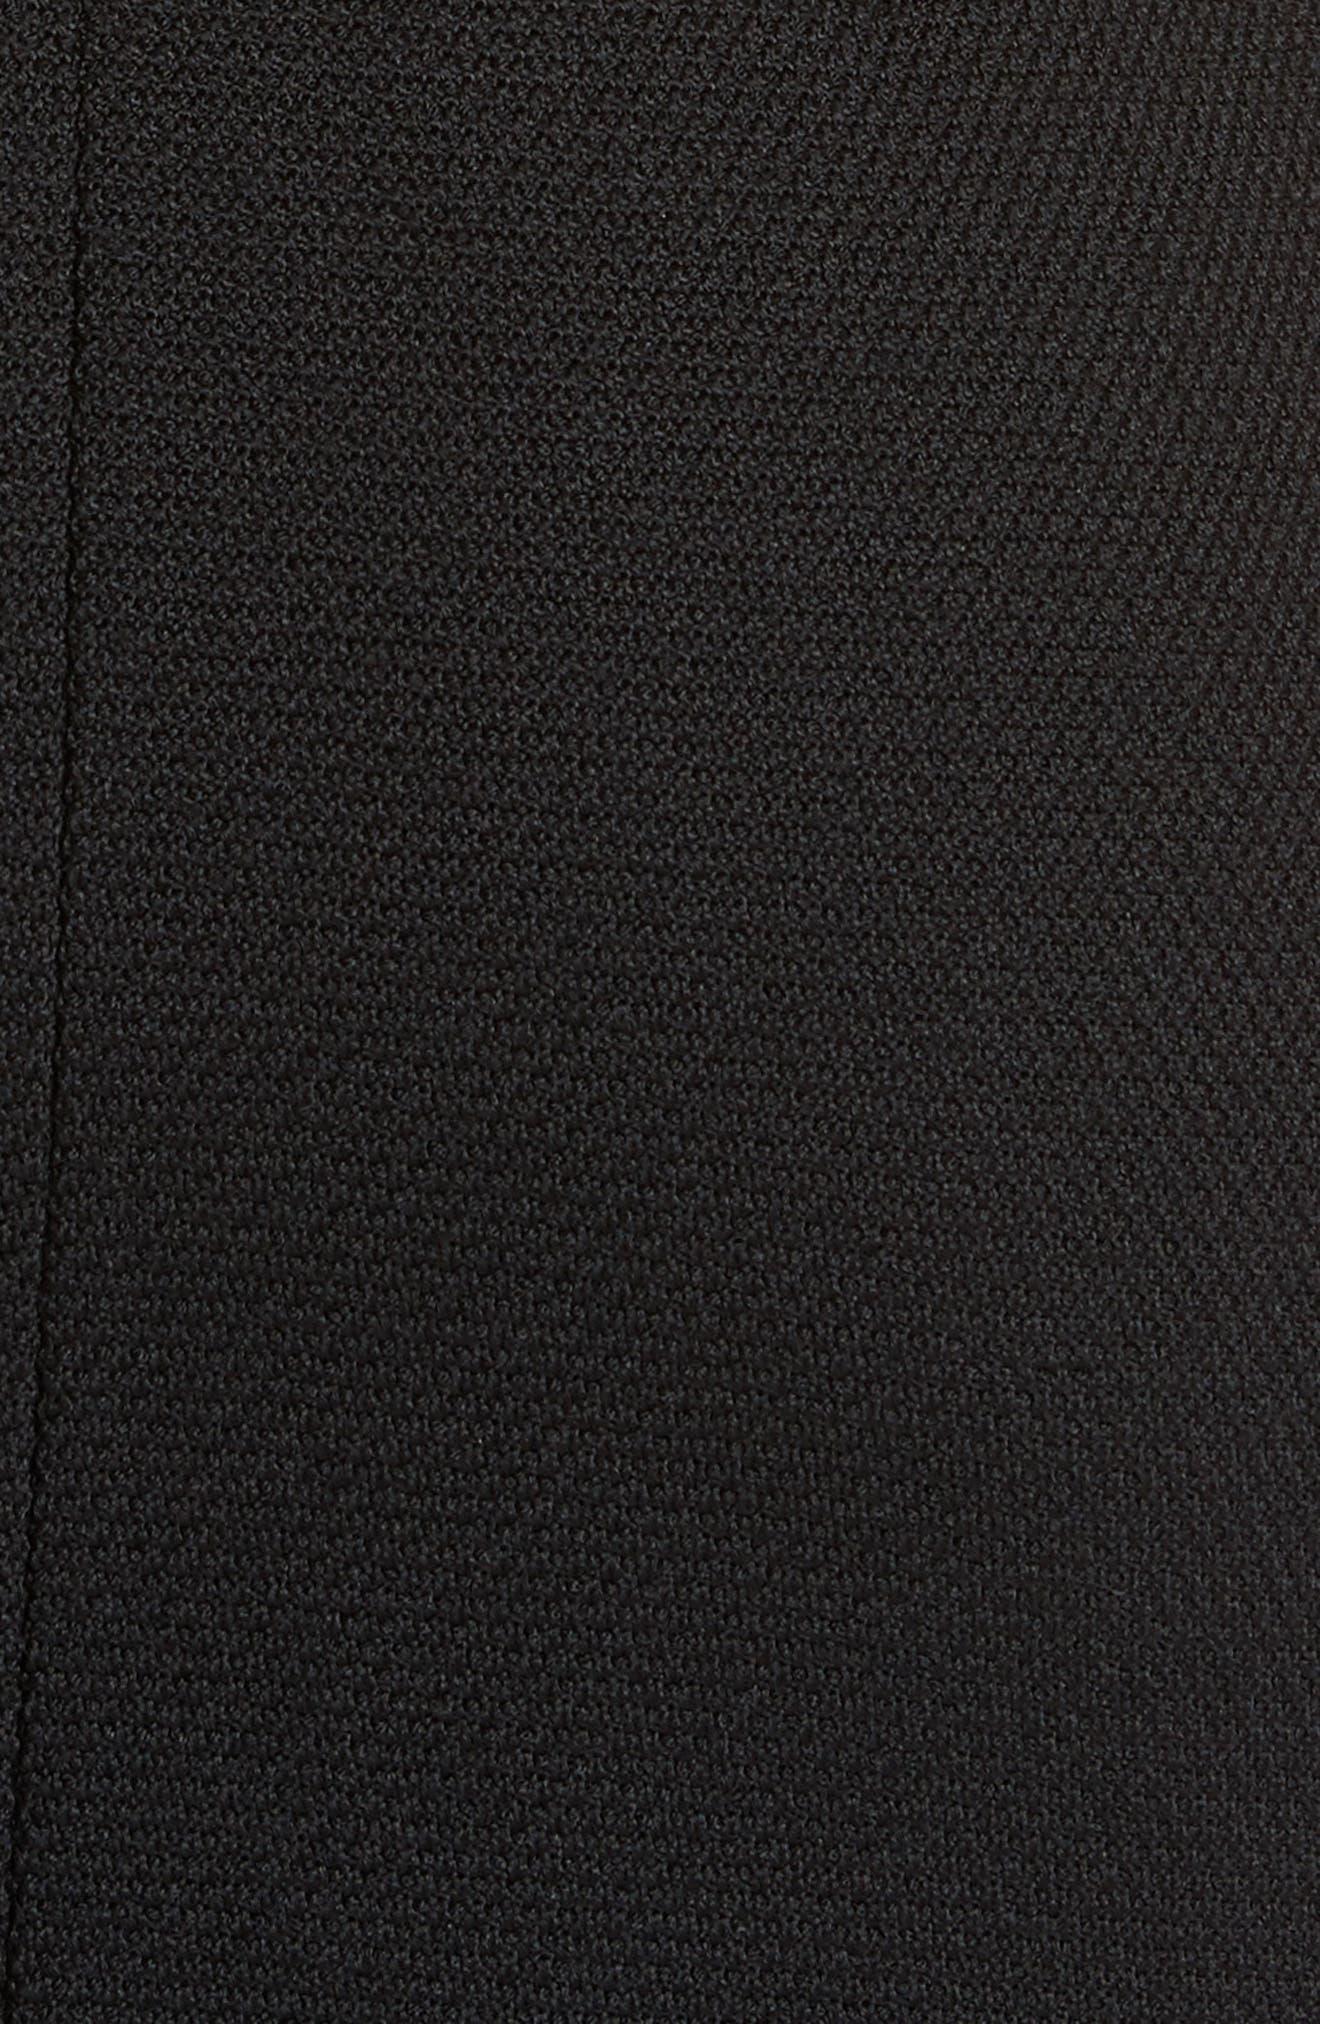 ST. JOHN COLLECTION, Micro Bouclé Knit Dress, Alternate thumbnail 5, color, CAVIAR